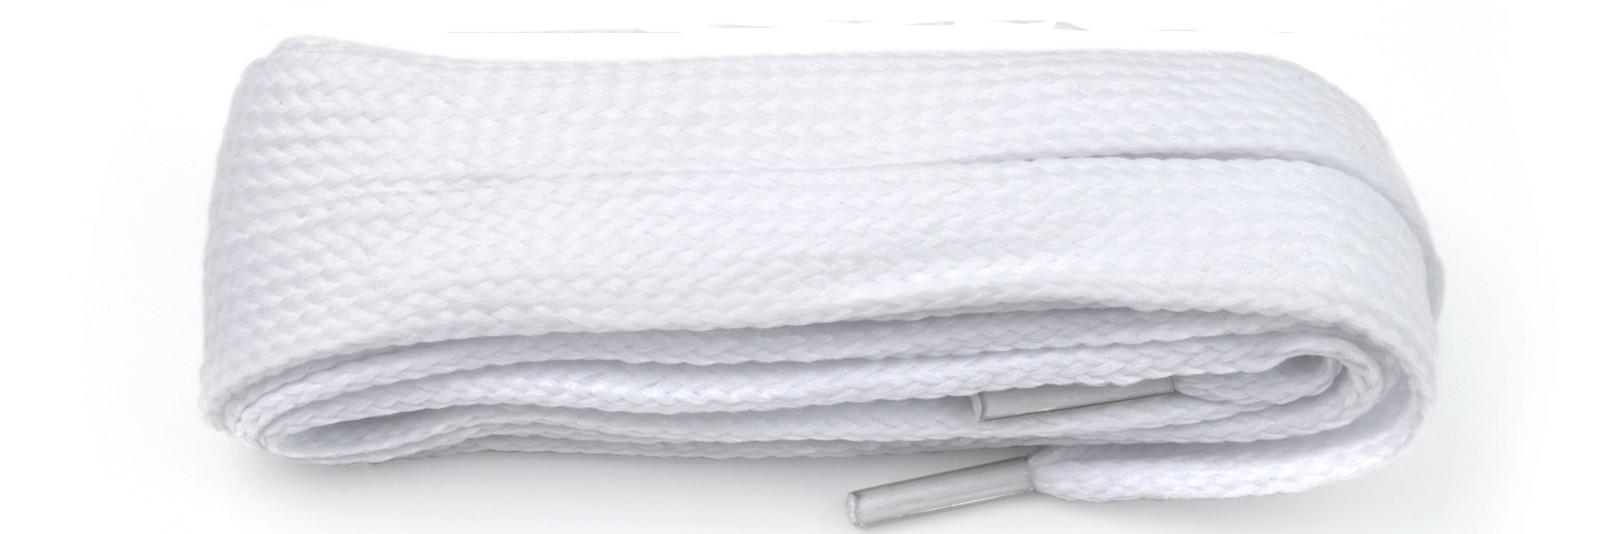 White Flat Block Laces